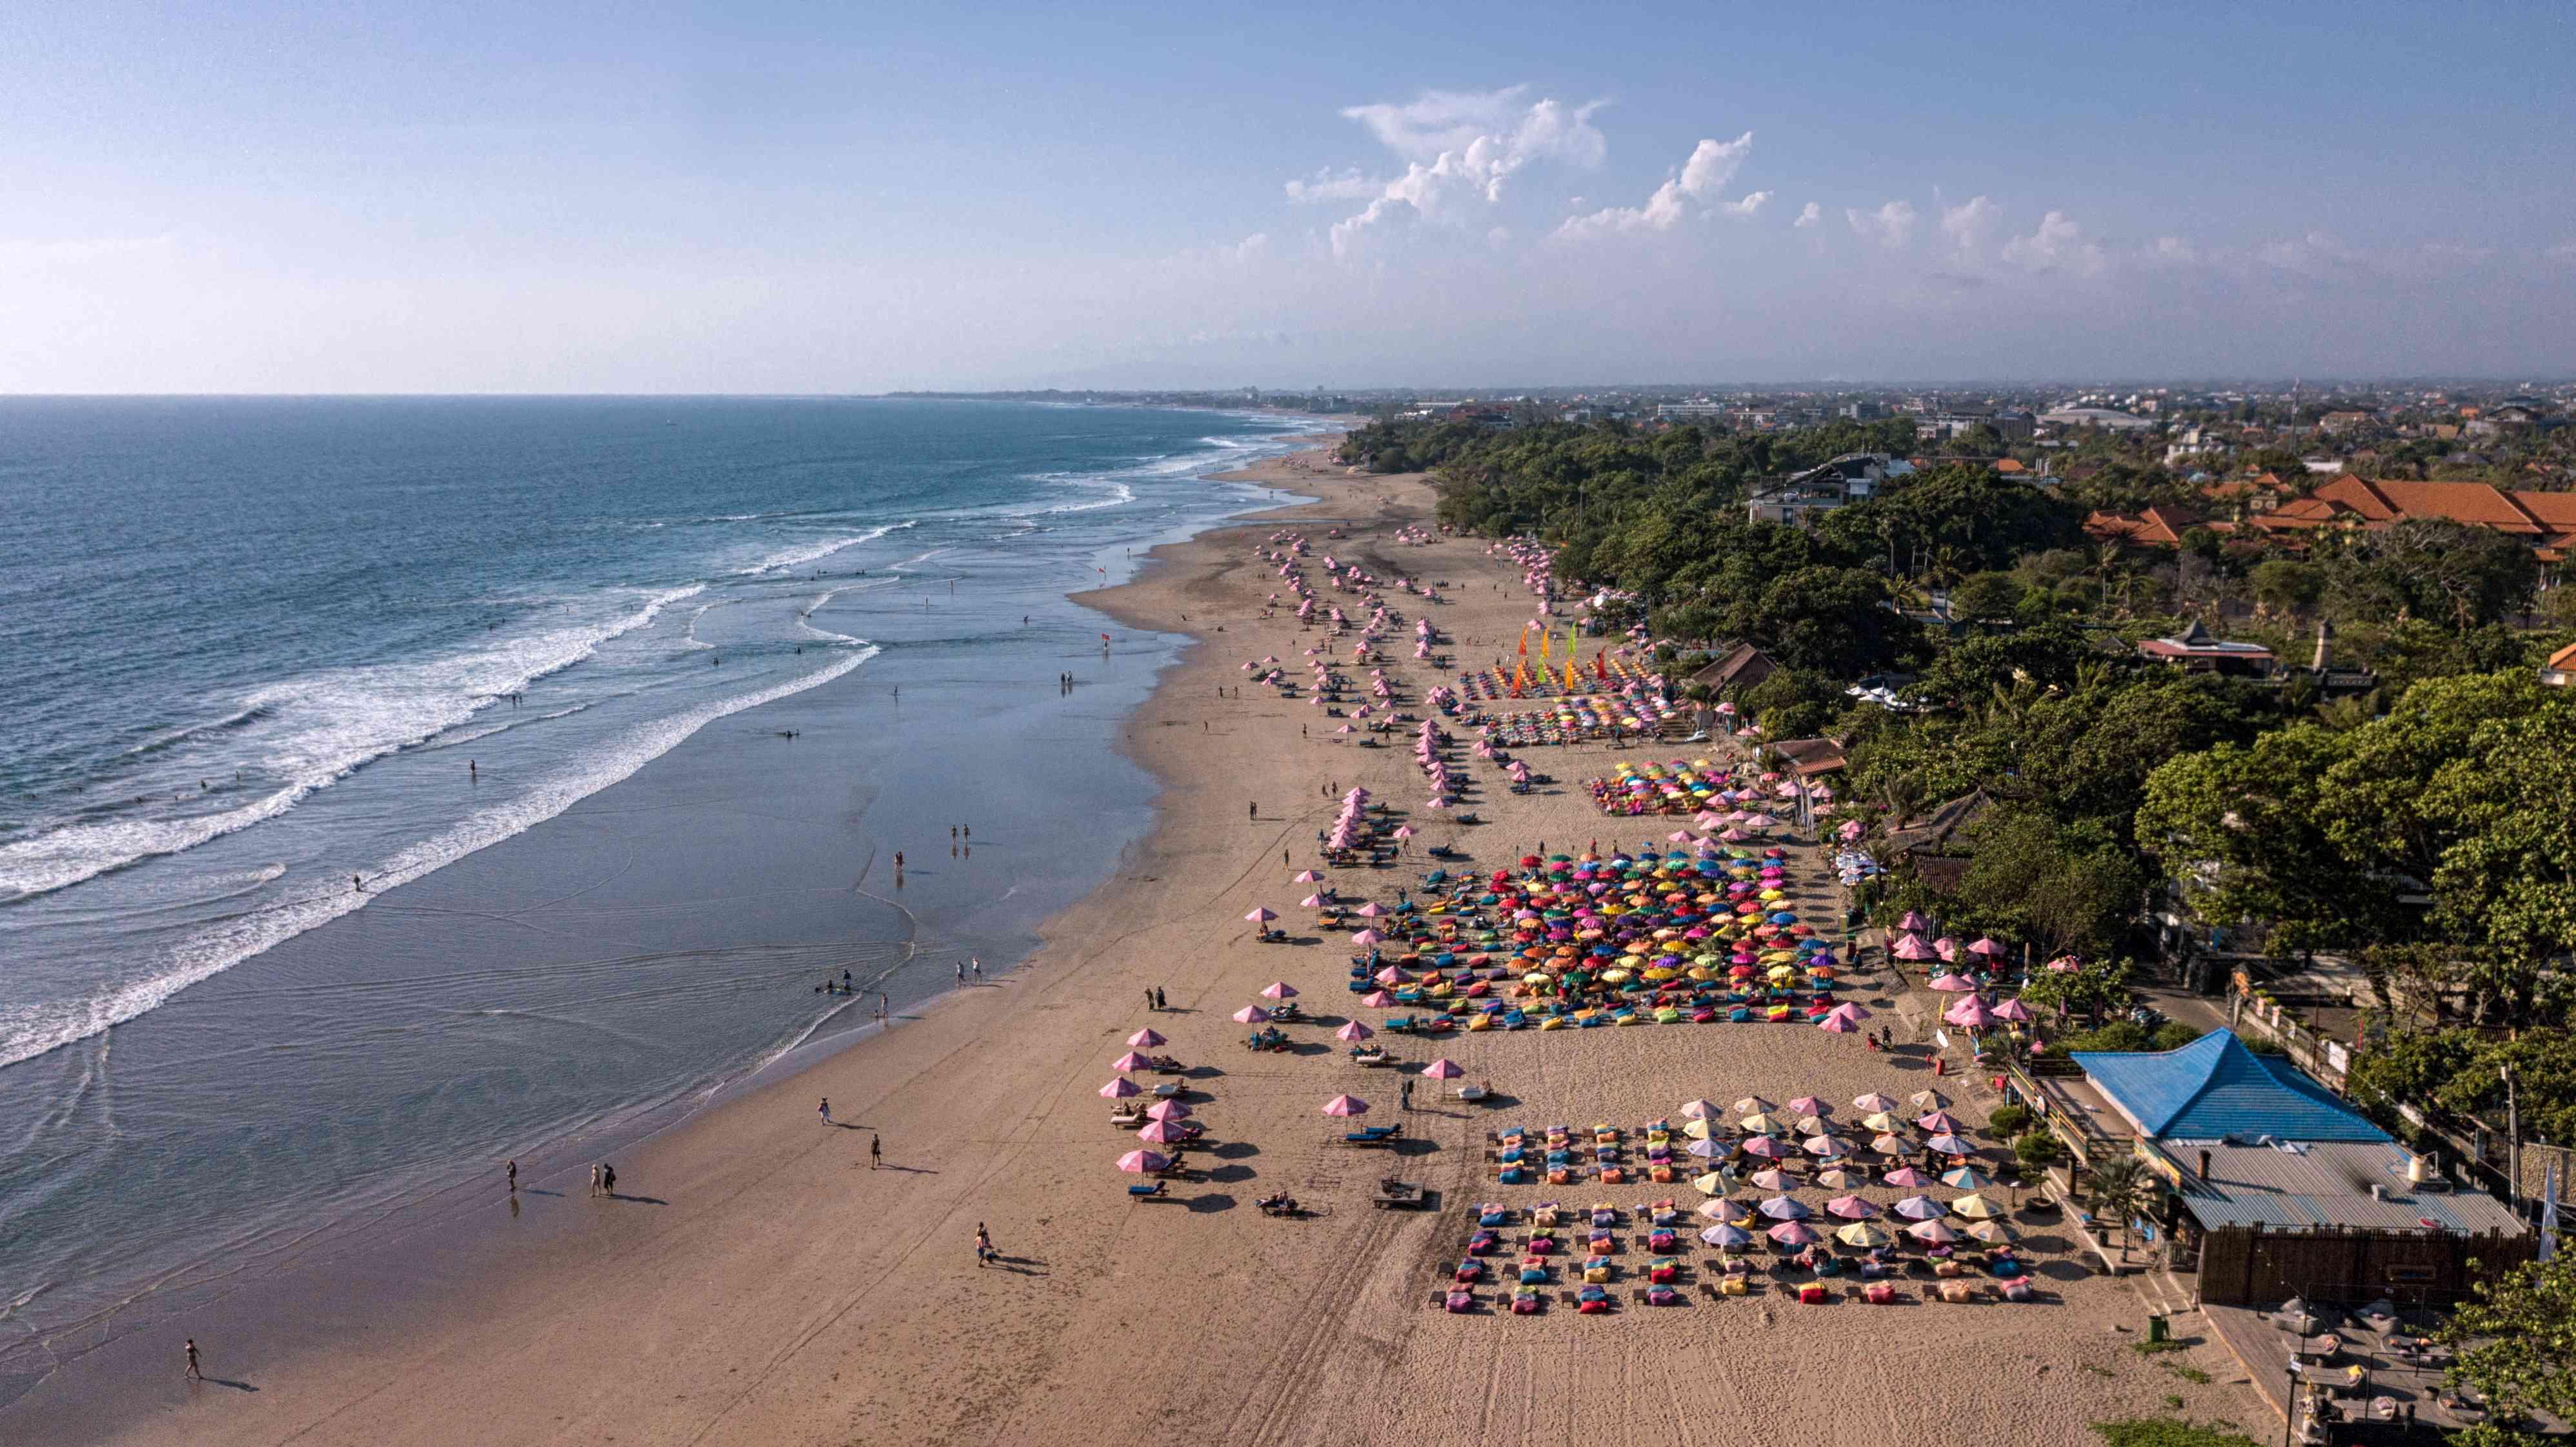 Aerial view of Kuta, Legian, and Seminyak beaches in Bali